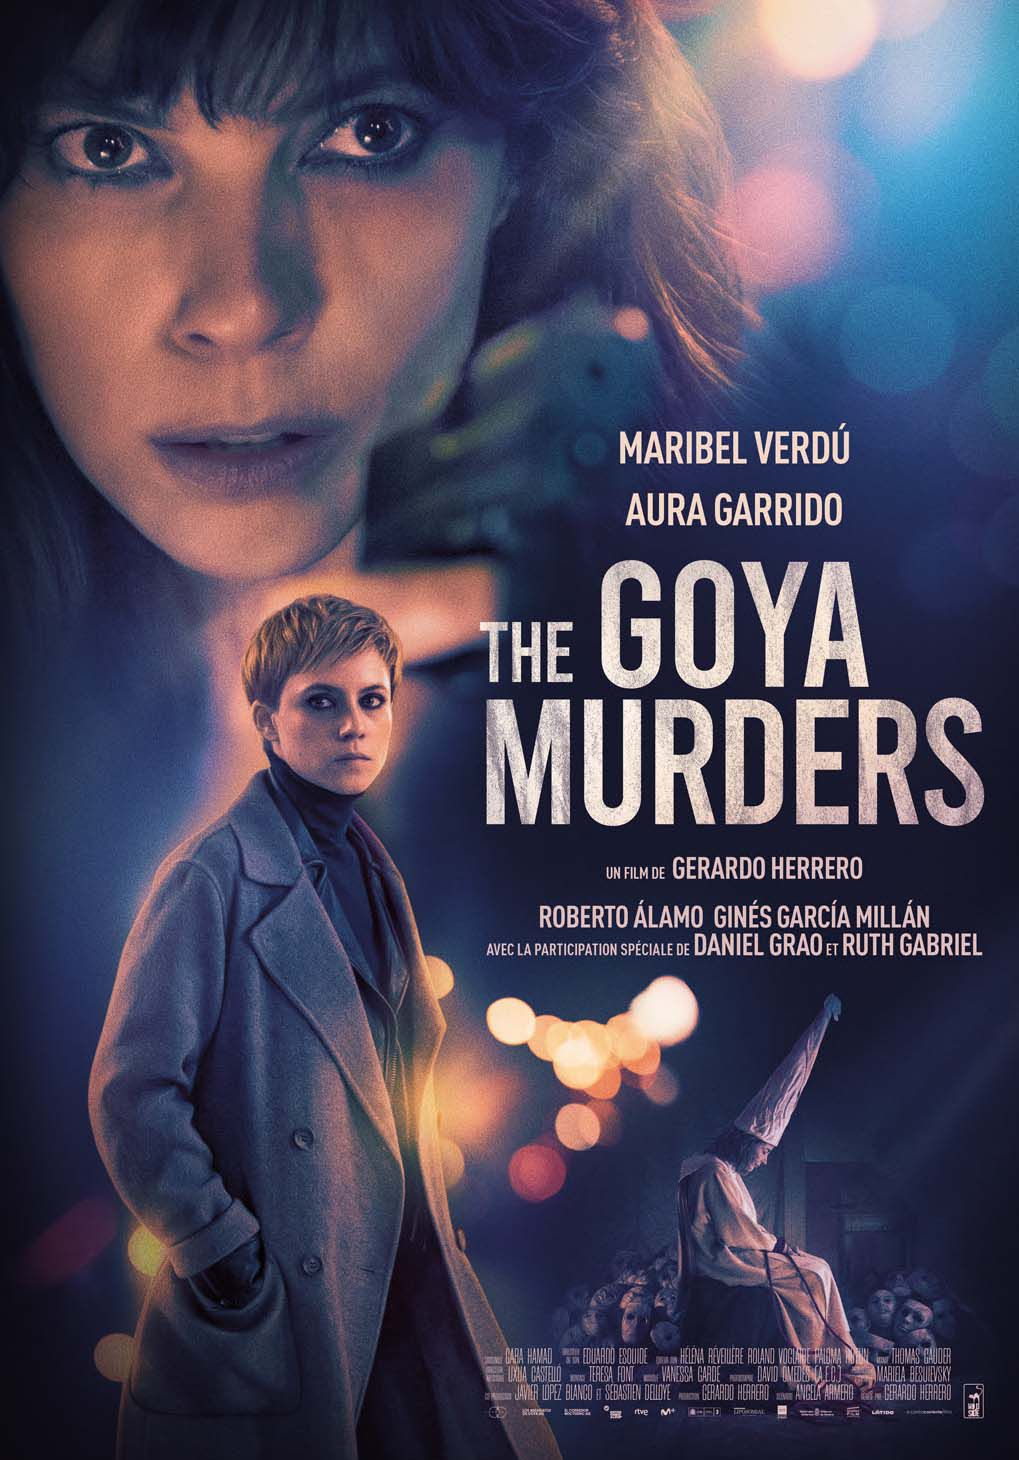 The Goya Murders (BANDE-ANNONCE) avec Maribel Verdú, Aura Garrido, Roberto Álamo - En VOD & achat digital le 30 juillet 2020